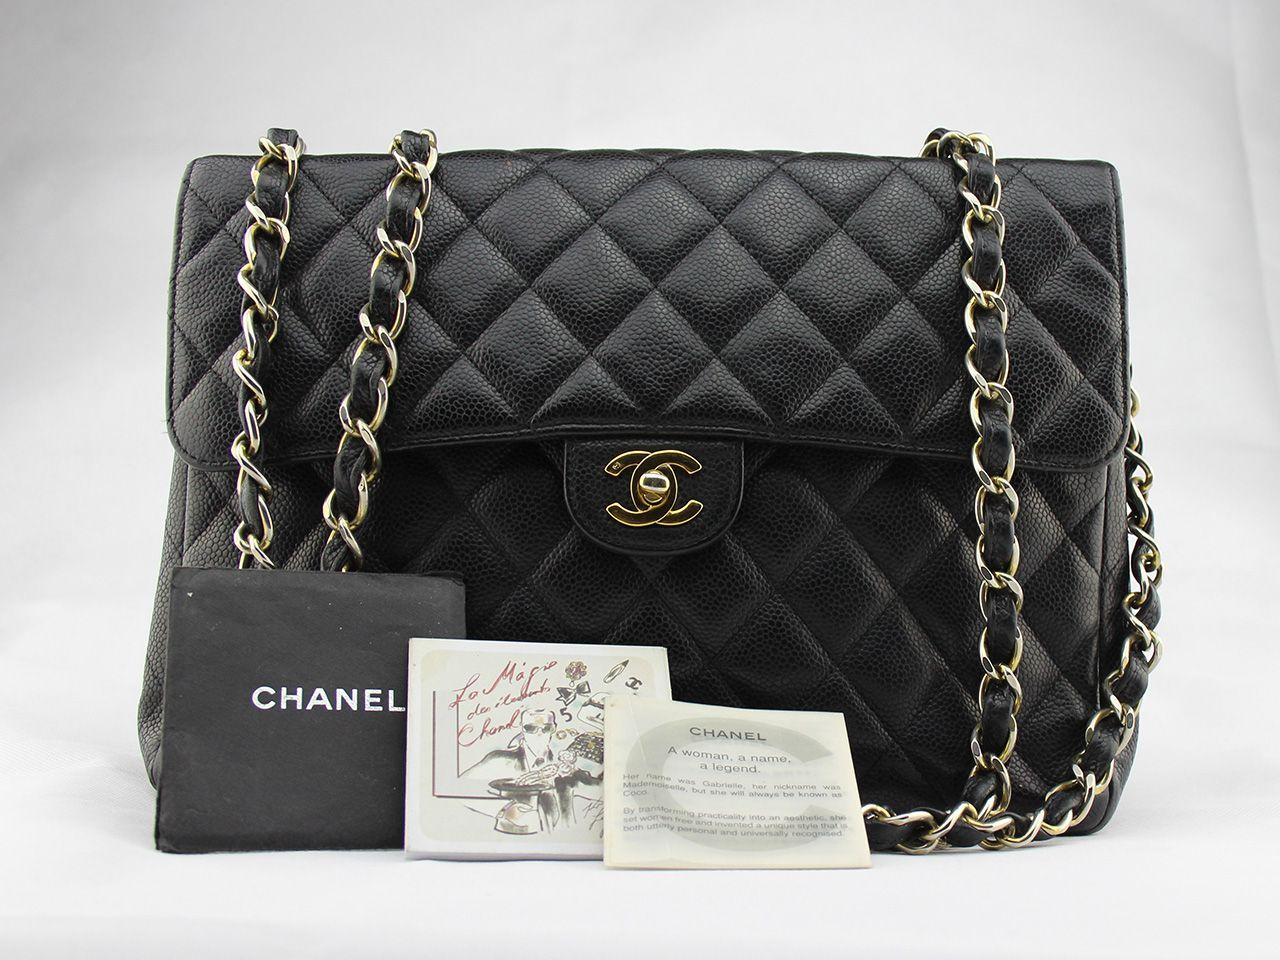 9c1c6cdc0ba4 Sac à main Chanel Timeless Jumbo en occasion Prix d occasion   1499 €    État quasi neuf